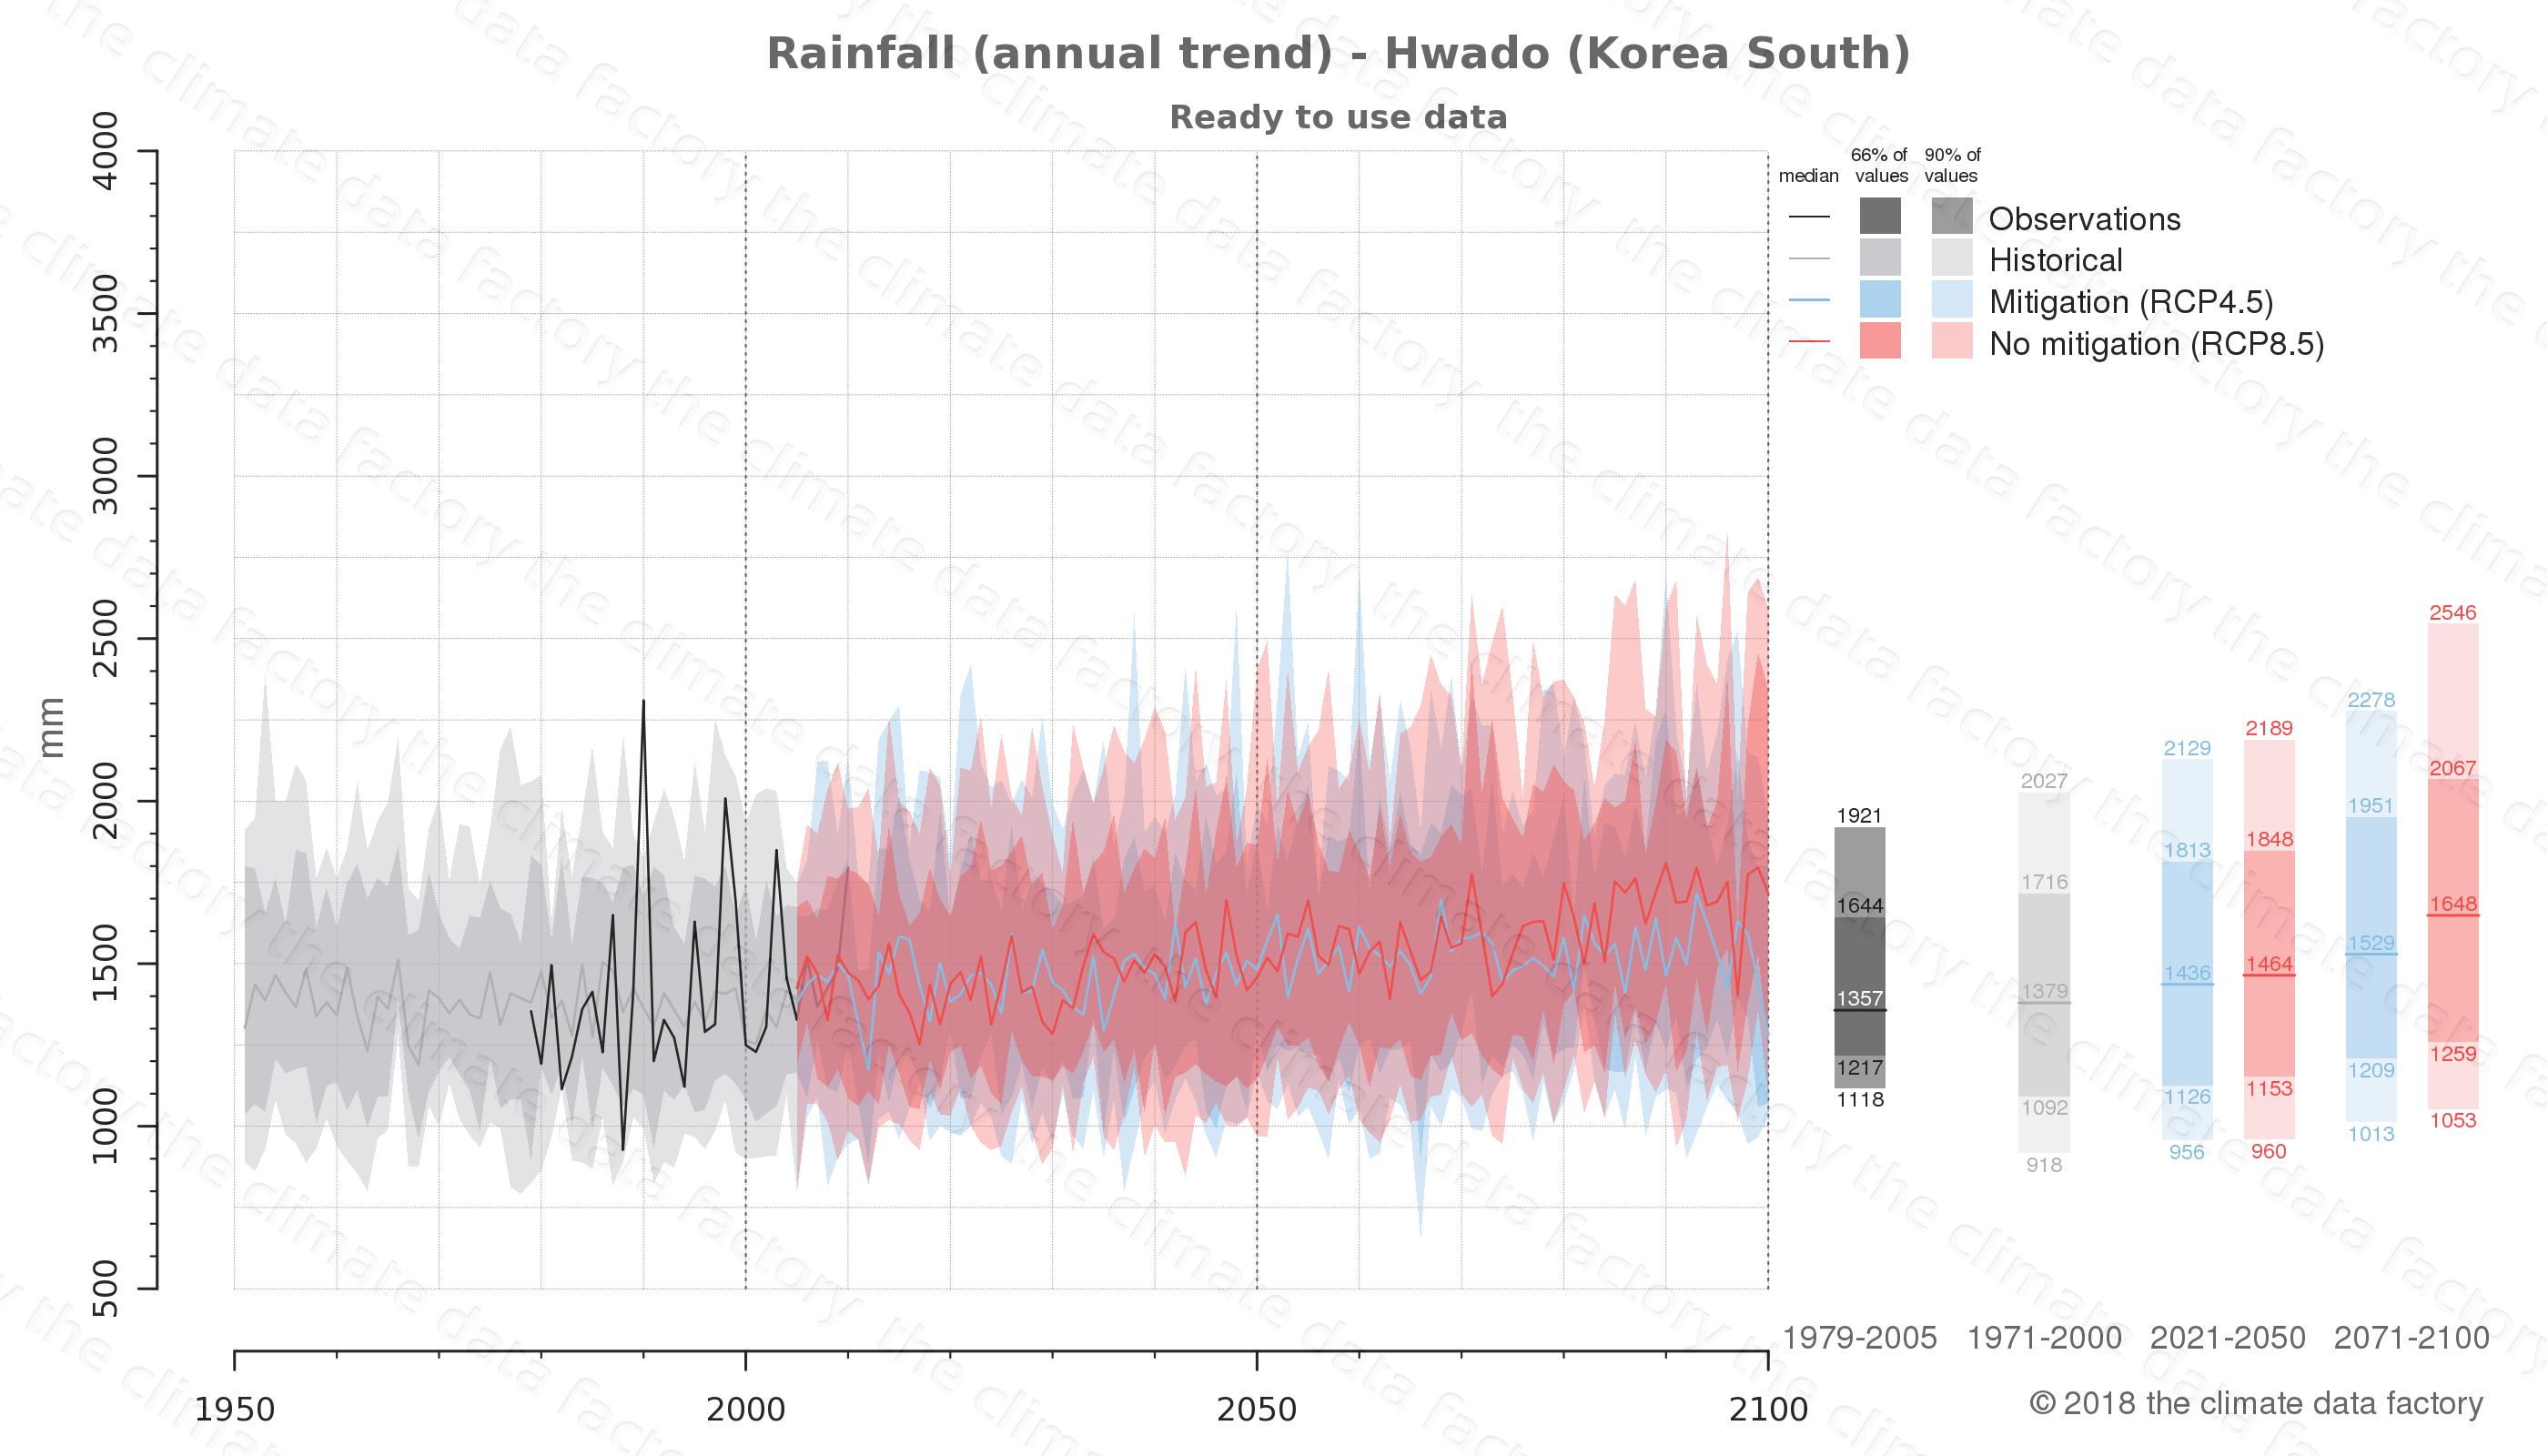 climate change data policy adaptation climate graph city data rainfall hwado south korea